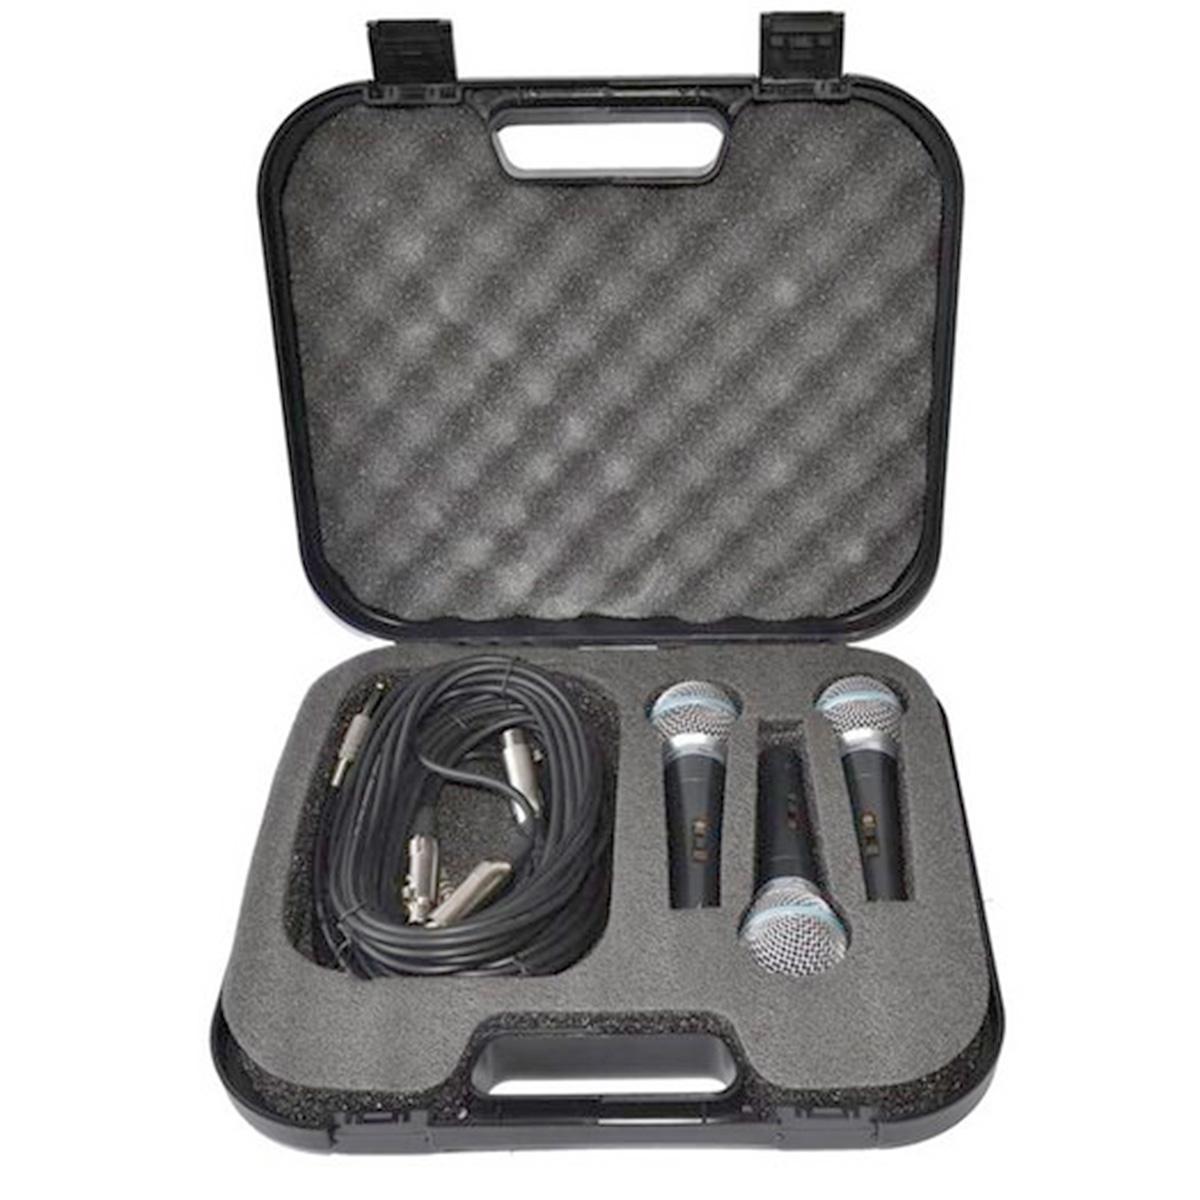 LC59 - Kit 3 Microfones c/ Fio de Mão LC 59 - Leacs